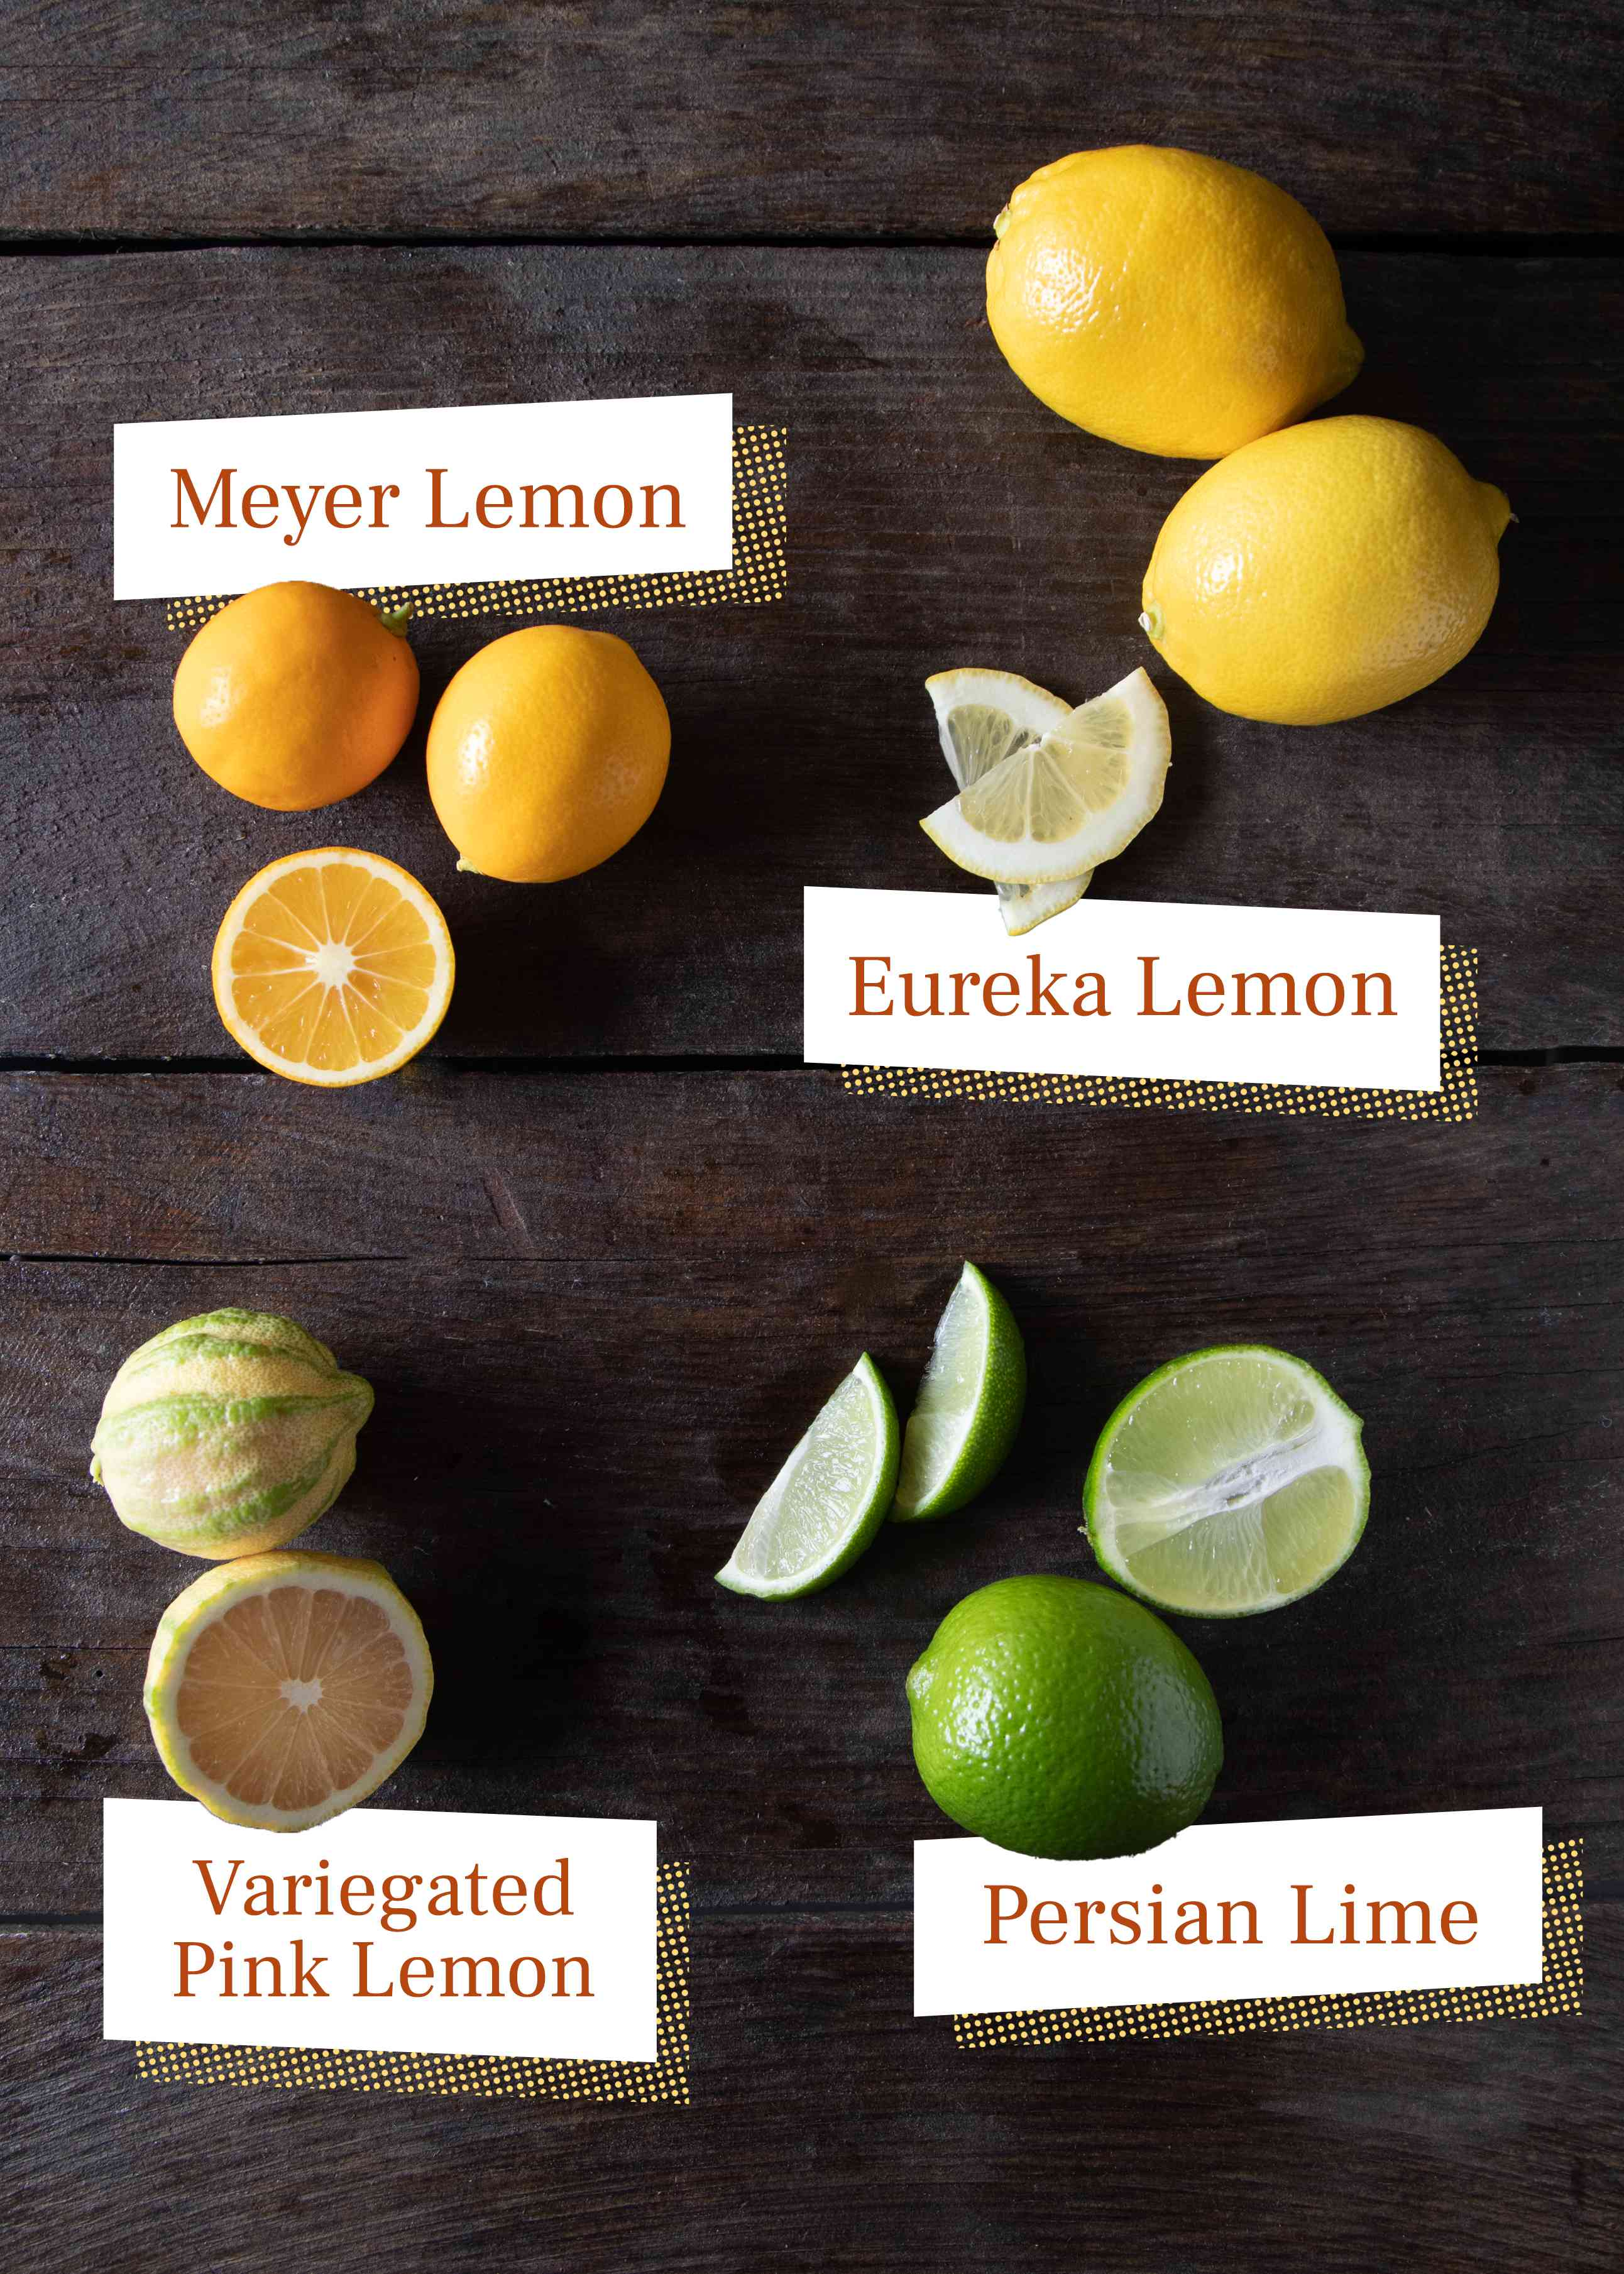 Lemon varieties, Meyer lemon, eureka lemon, pink lemon, and Persian lime